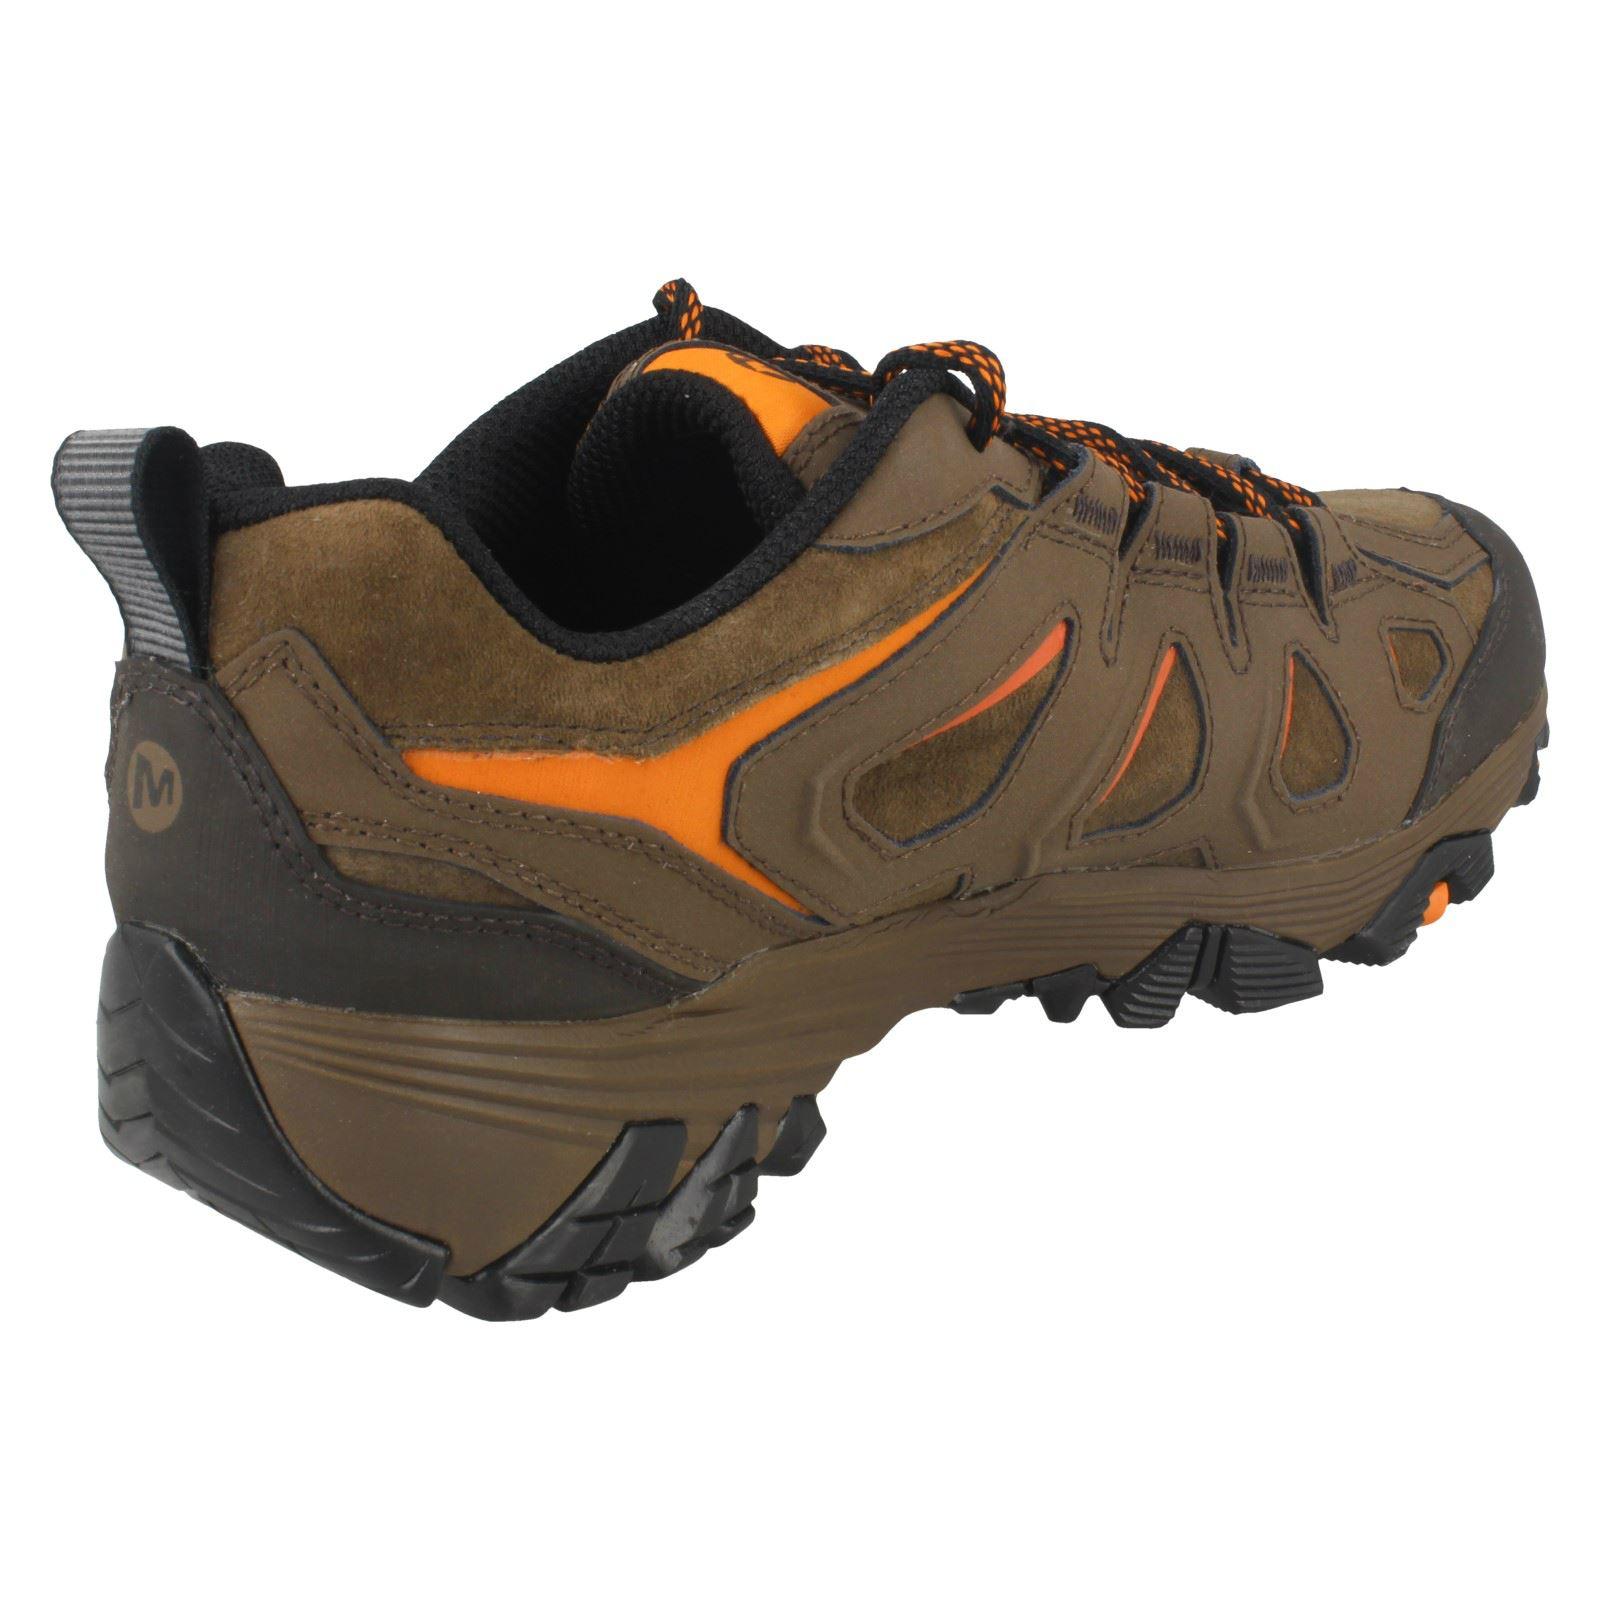 Merrell Merrell Merrell Hombre Walking Trainers - Moab Fst Ltr J37809 403dc6